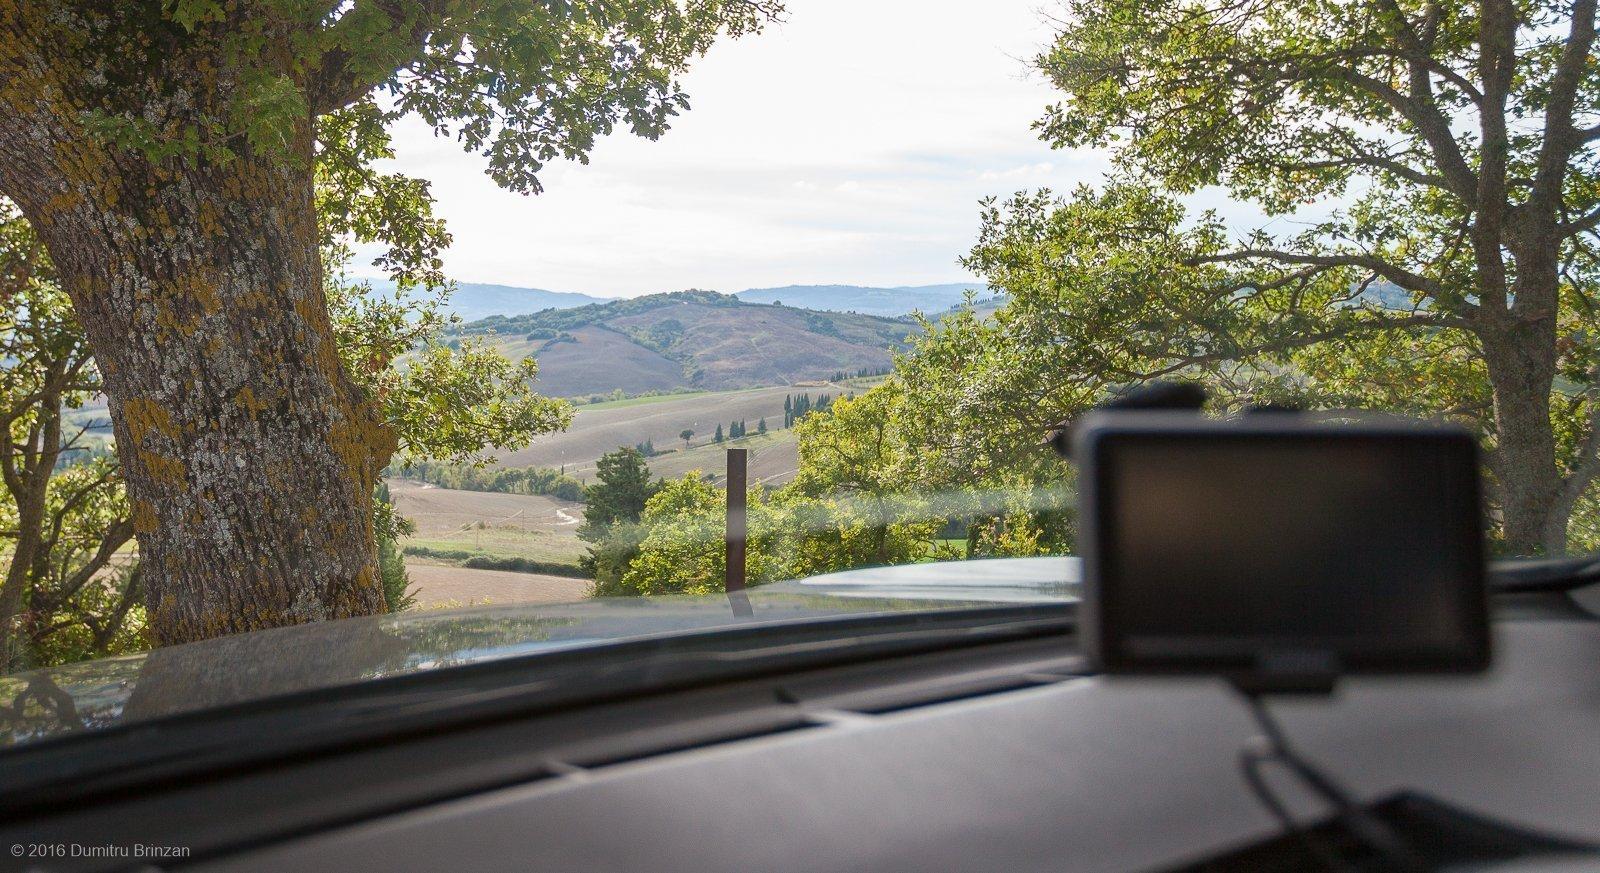 2016-podere-il-casale-pienza-5-parking-view